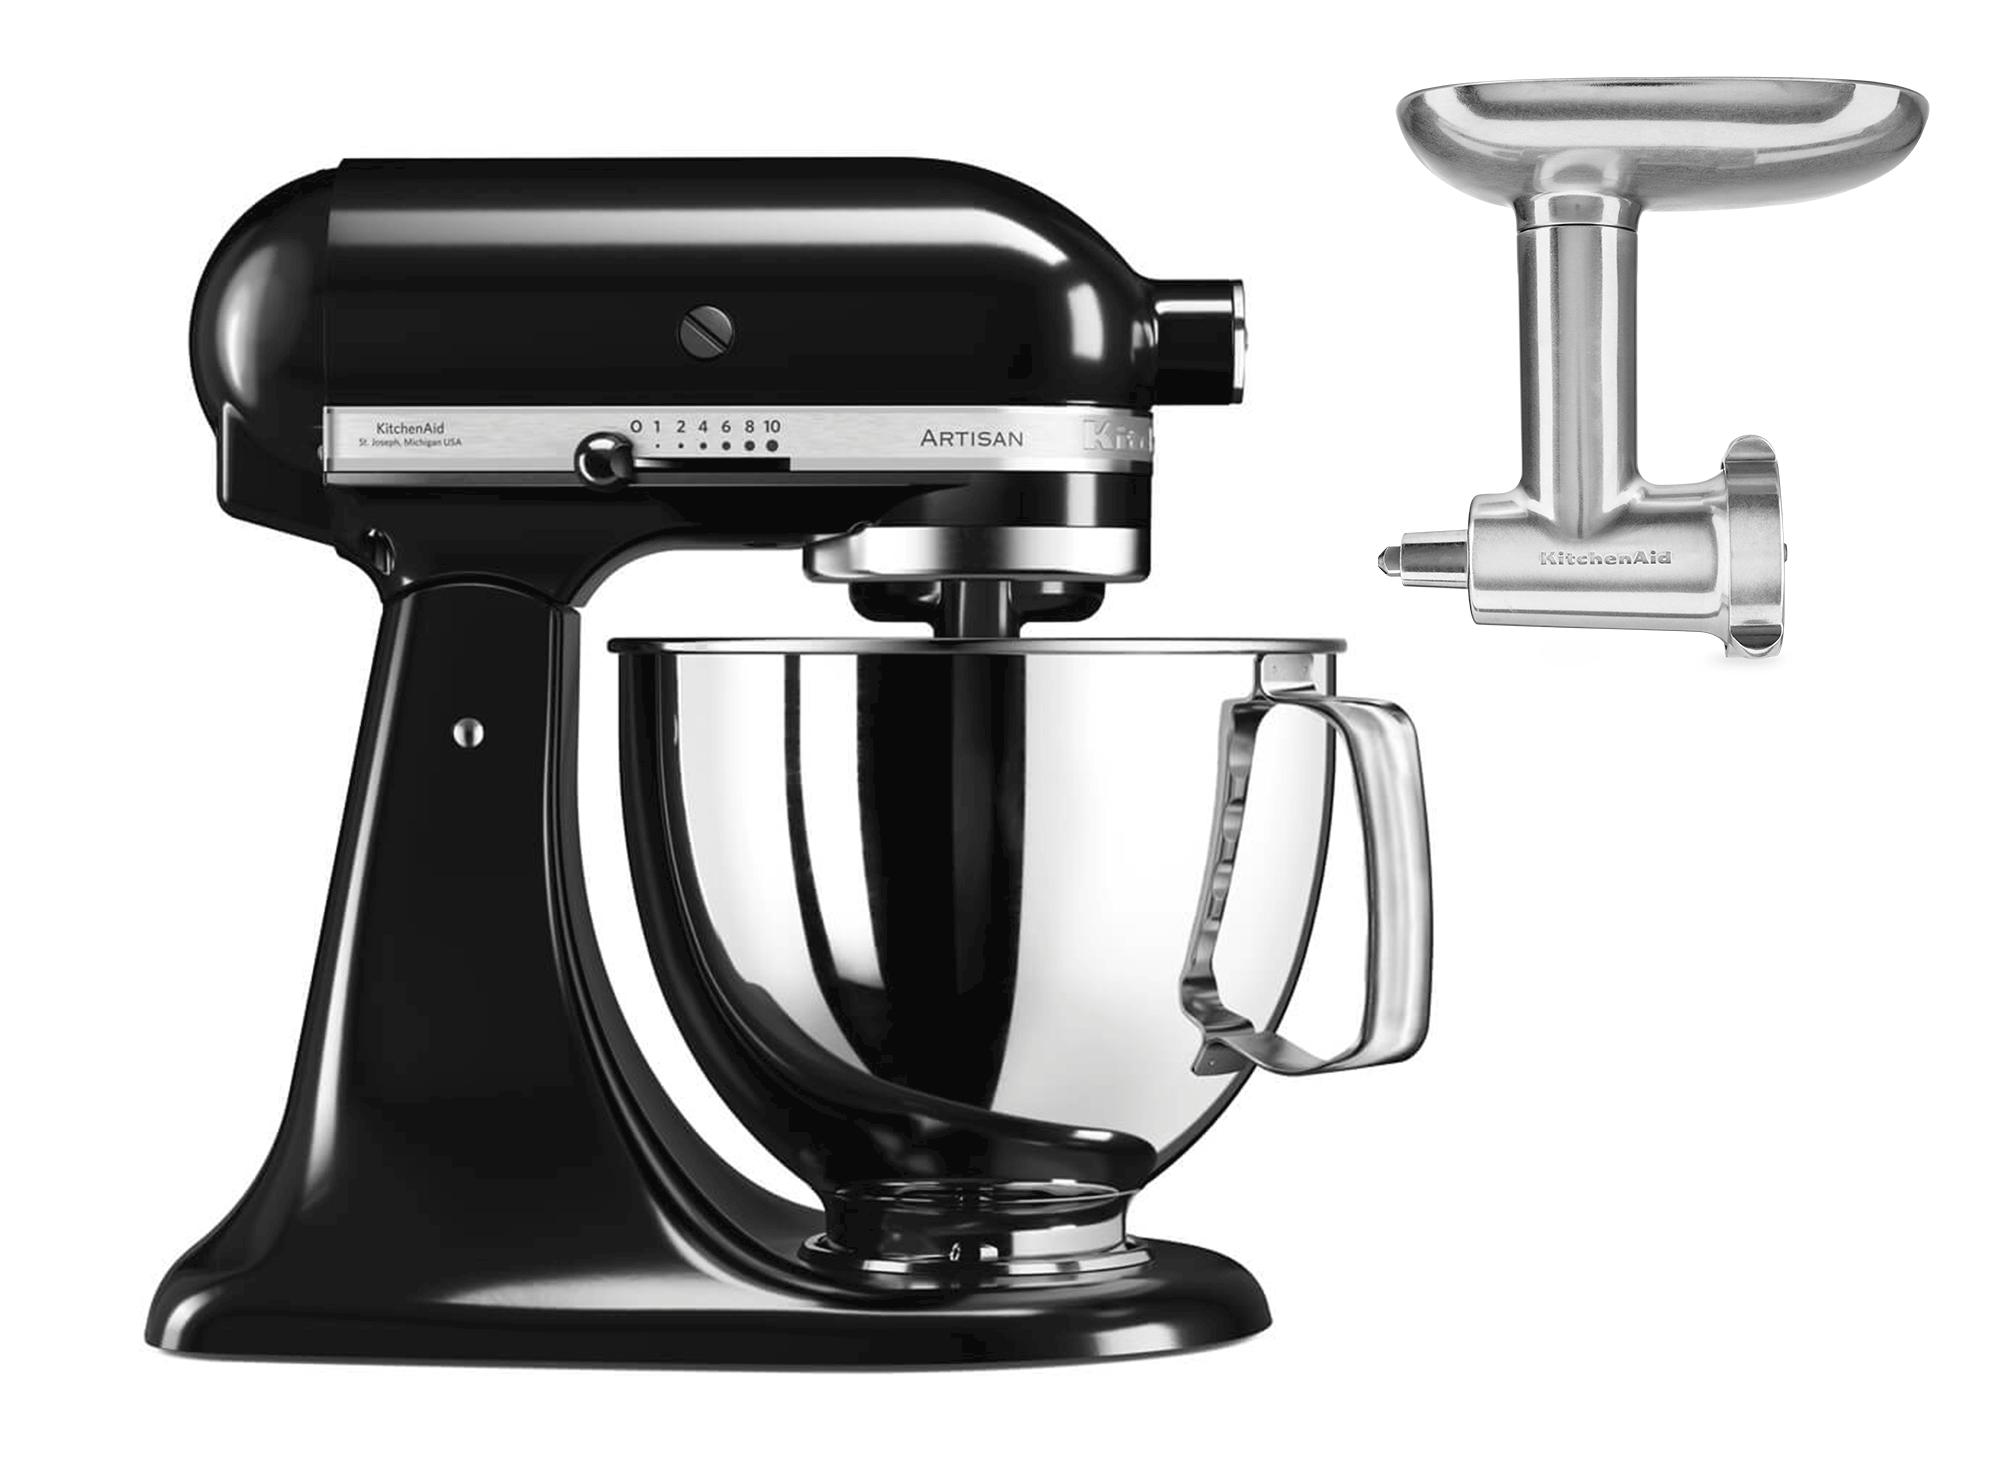 KitchenAid Artisan KSM125PSEOB Svart + Kjøttkvern Metall